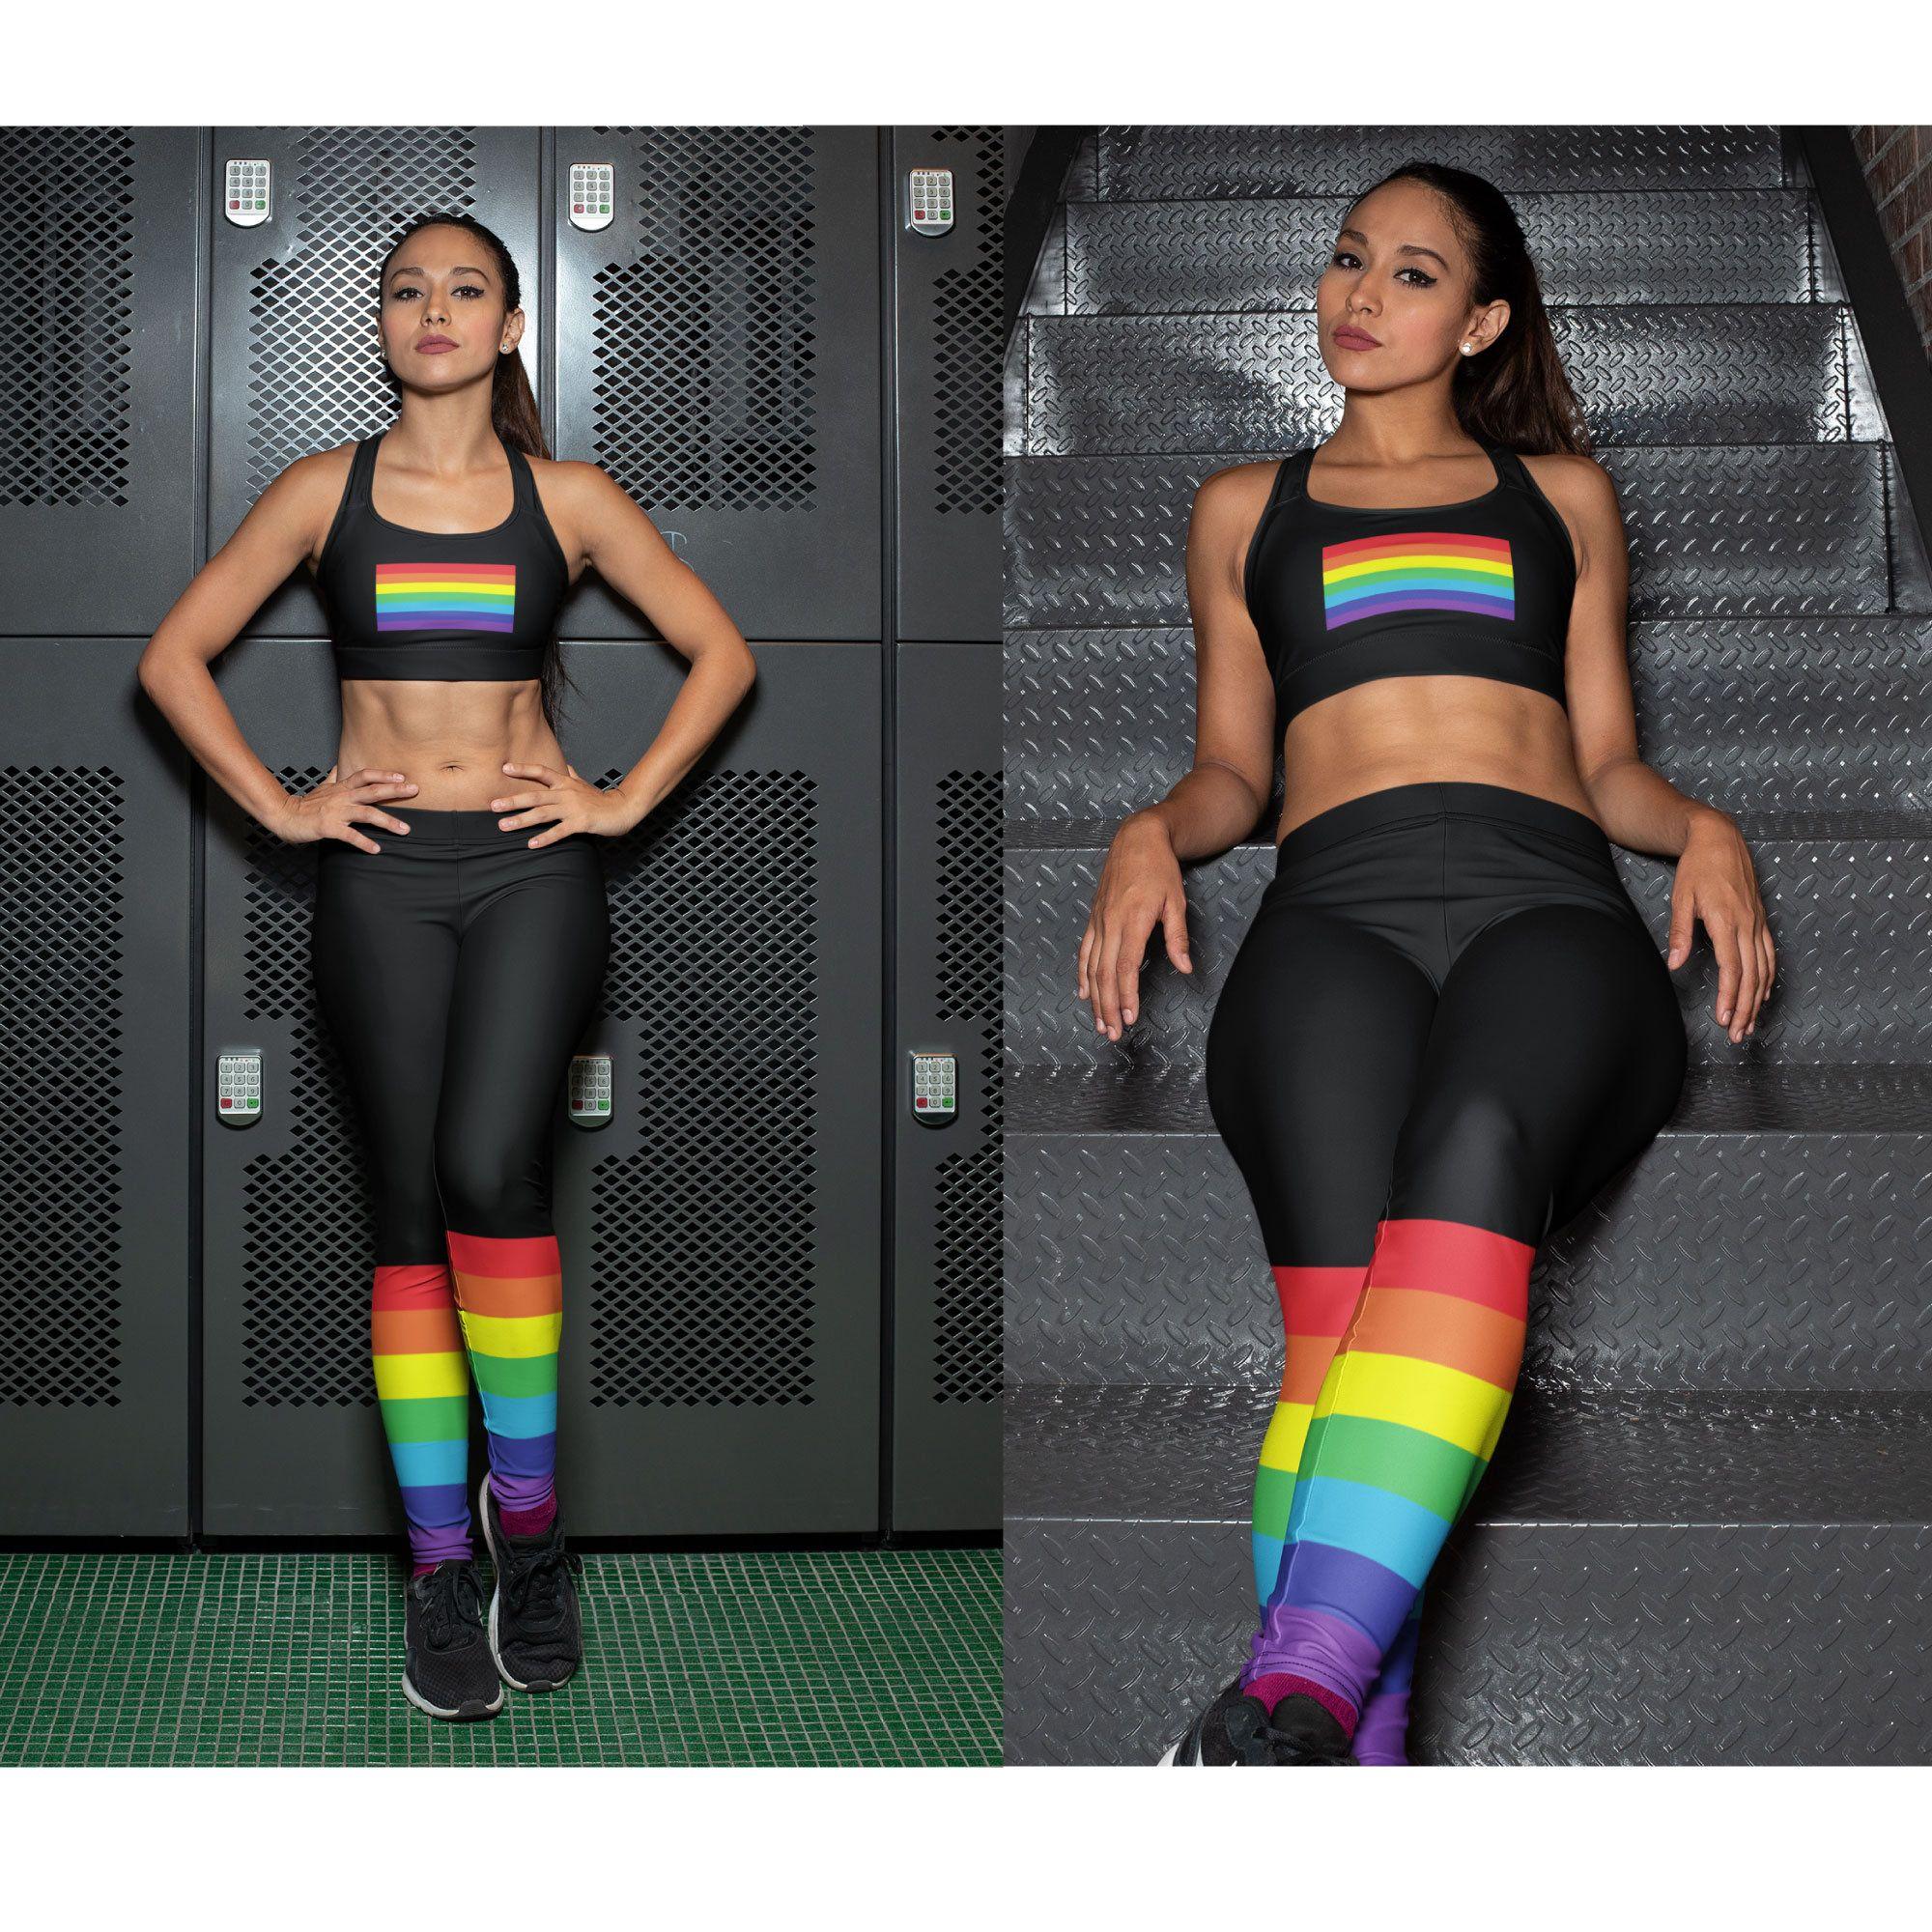 Pansexual Flag Activewear Pansexual Sports Bra Pan Pride Flag LGBTQ+ Pride Festival Top Pansexual Pride Training Bra Pan Pride Yoga Bra